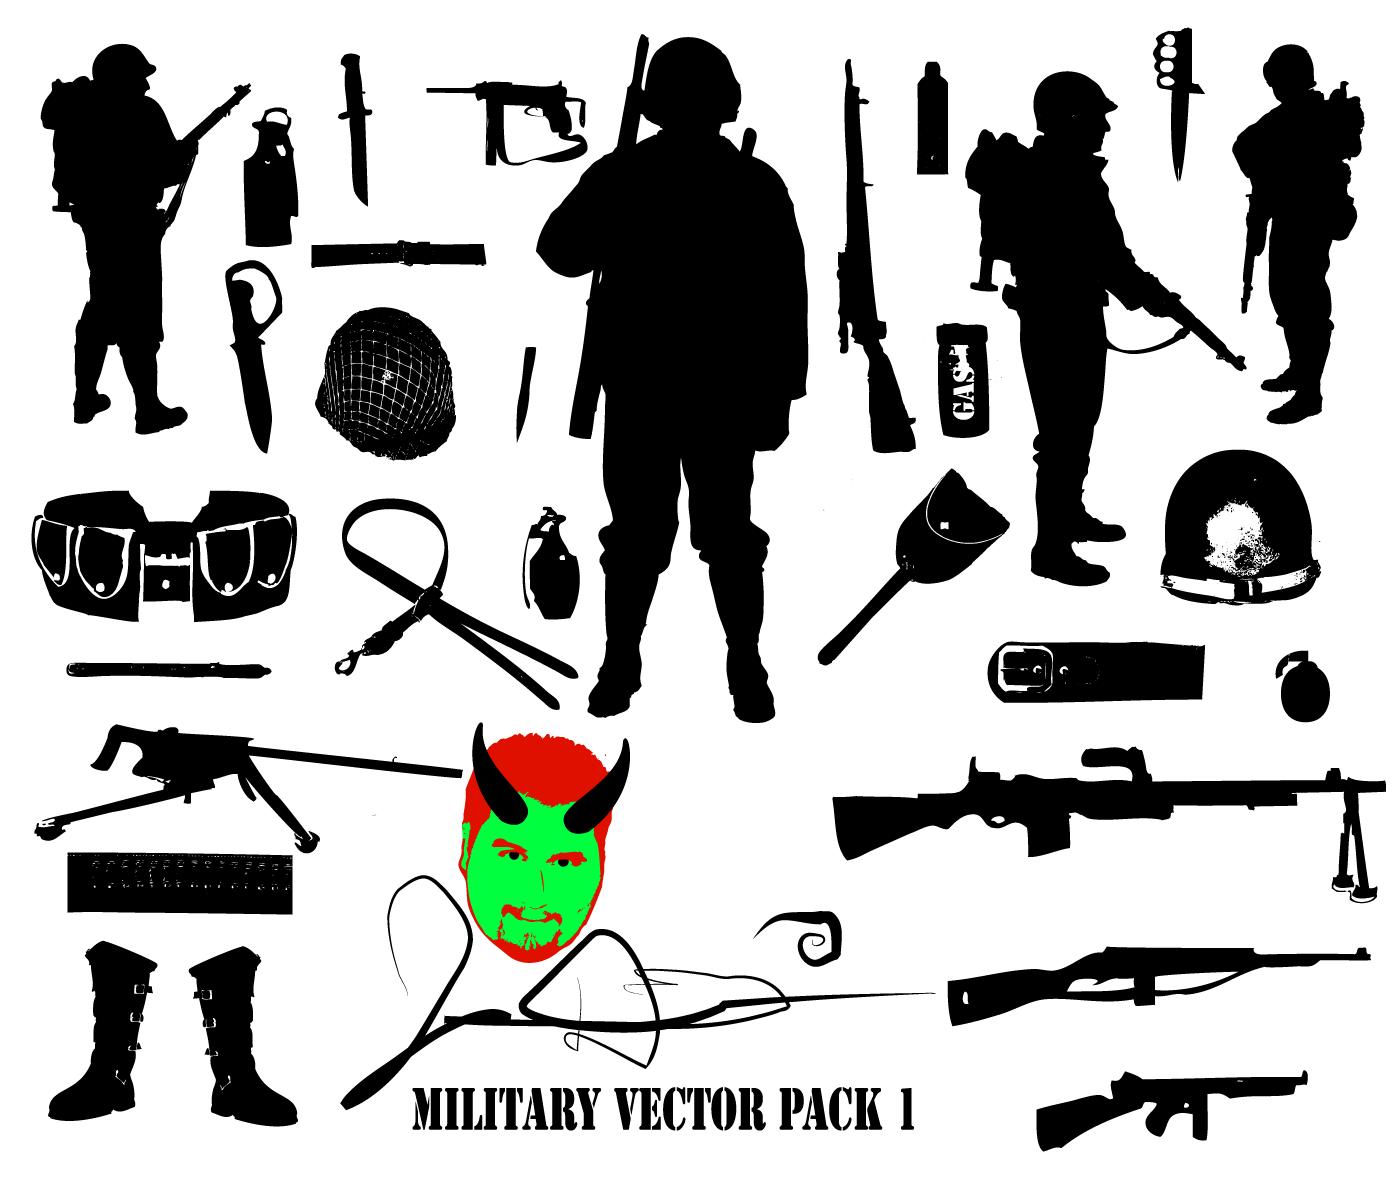 Military Vector Pack 1 by MaxDaMonkey